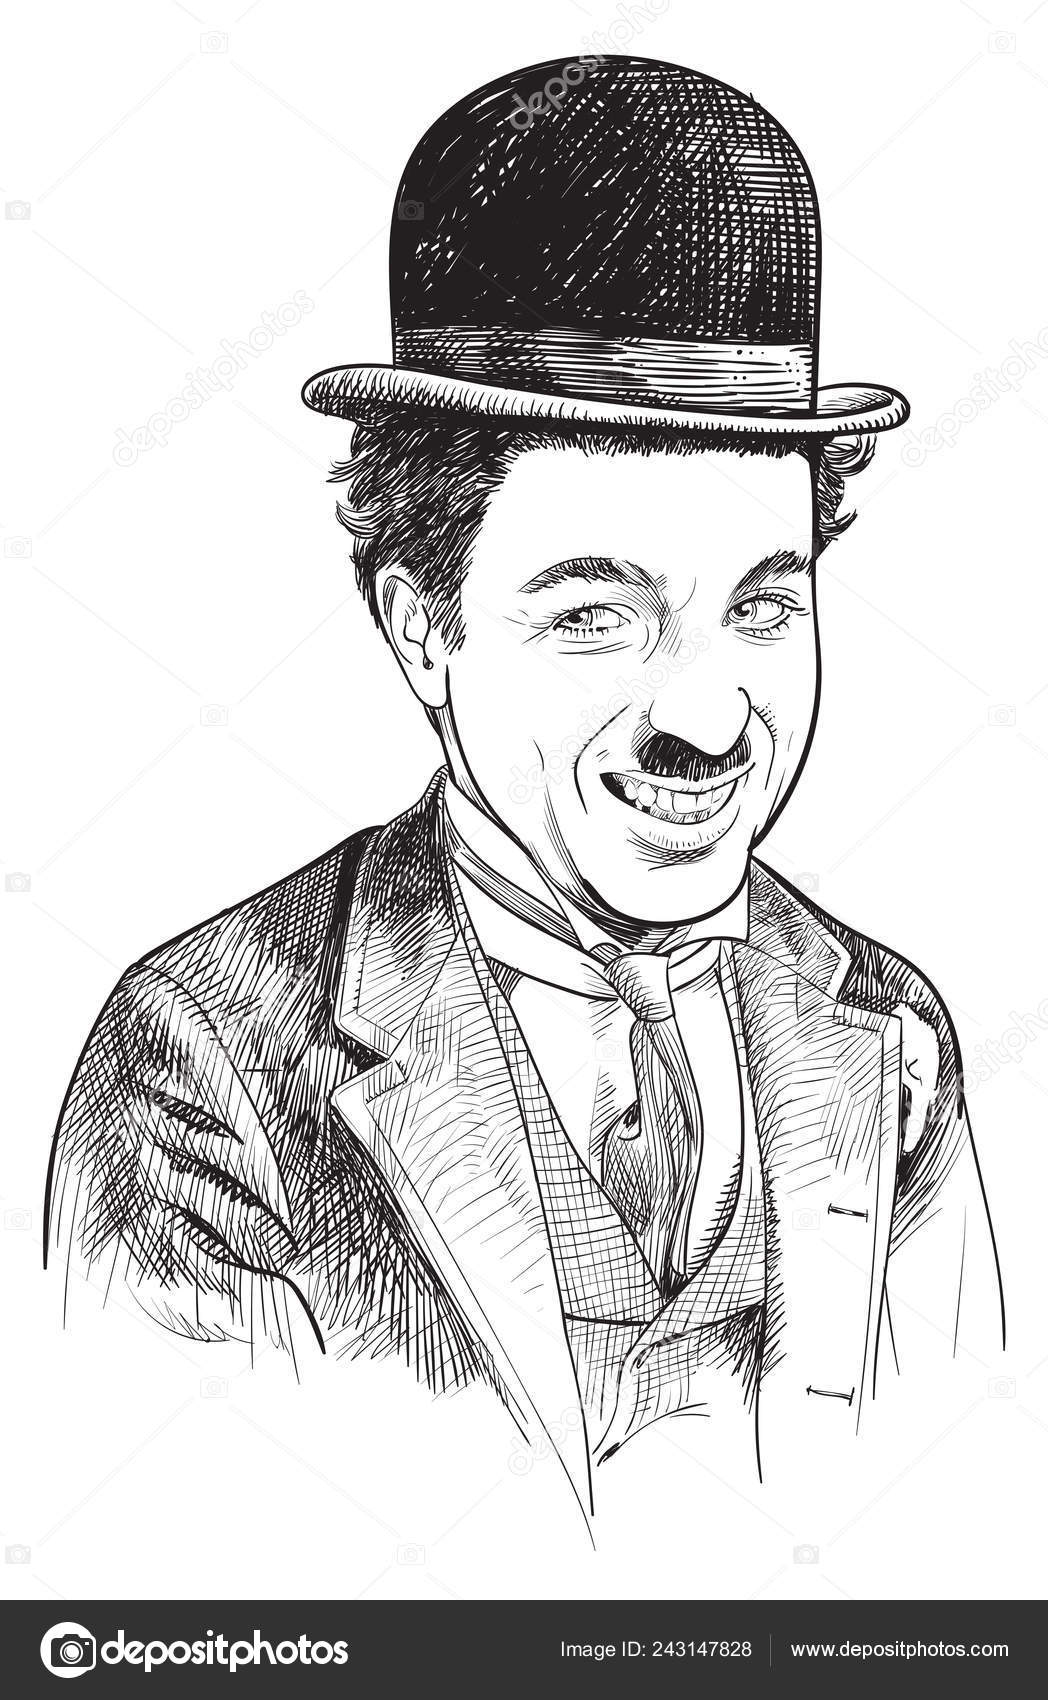 images?q=tbn:ANd9GcQh_l3eQ5xwiPy07kGEXjmjgmBKBRB7H2mRxCGhv1tFWg5c_mWT Trends For Vector Art Portrait Maker @koolgadgetz.com.info